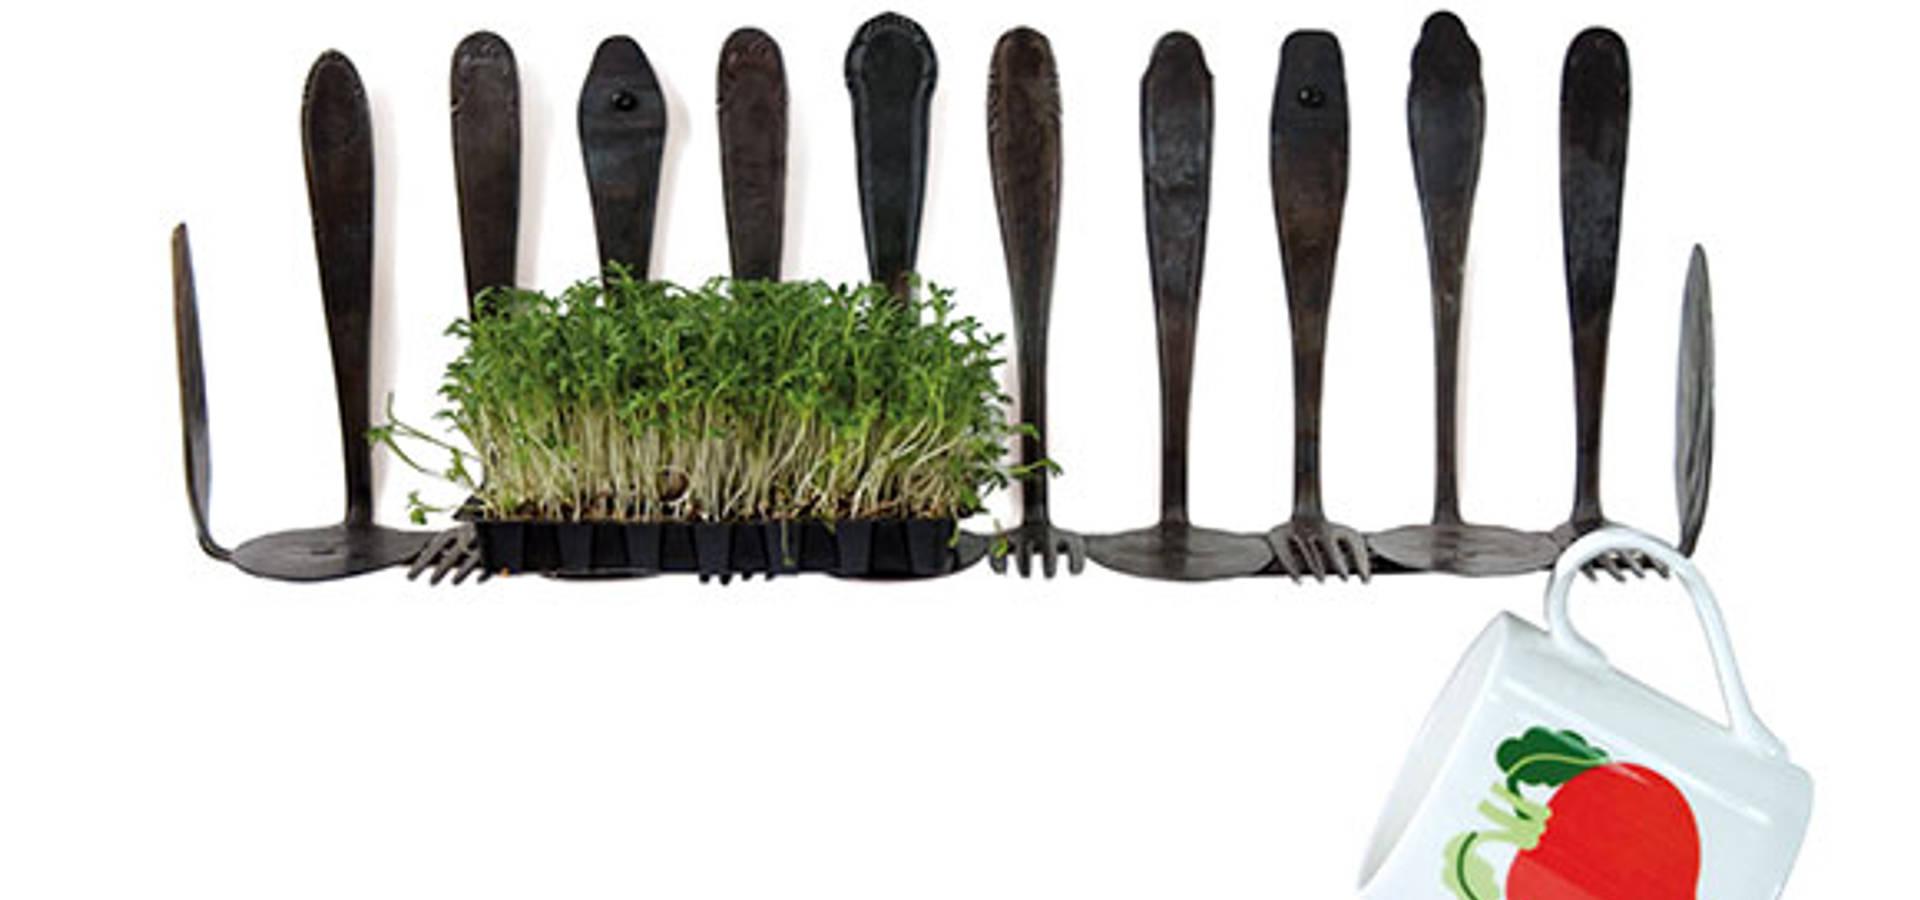 Tisch von anna fankhaenel produktdesign homify for Produktdesign bonn